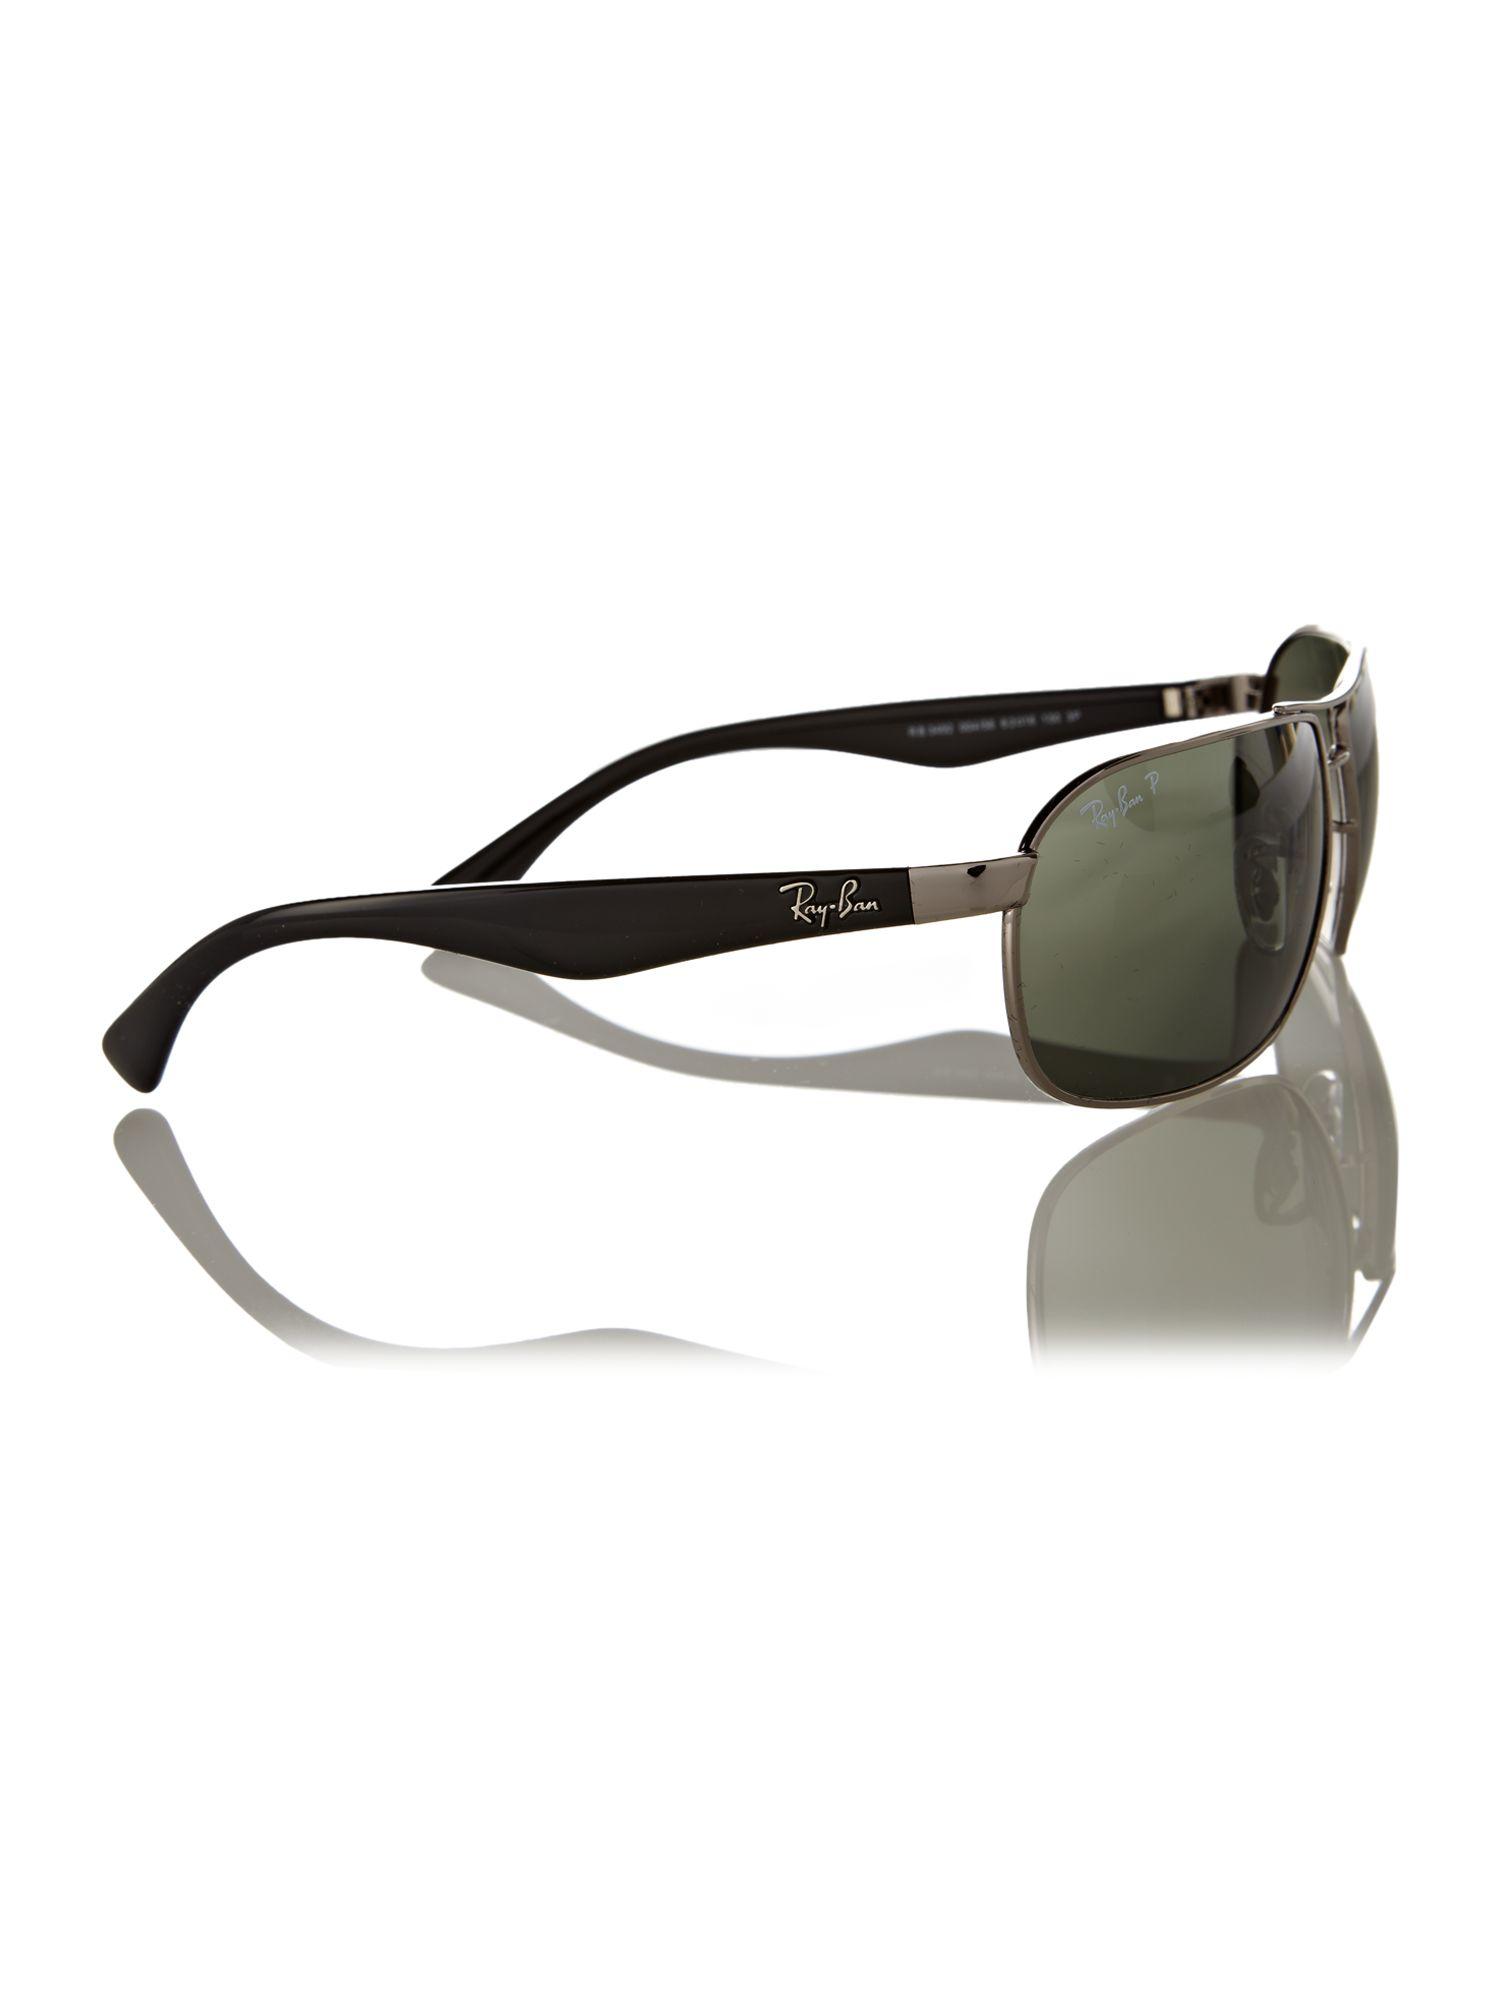 Ray Ban Mens Rb3492 Gunmetal Polar Square Sunglasses In Metallic For Men Lyst